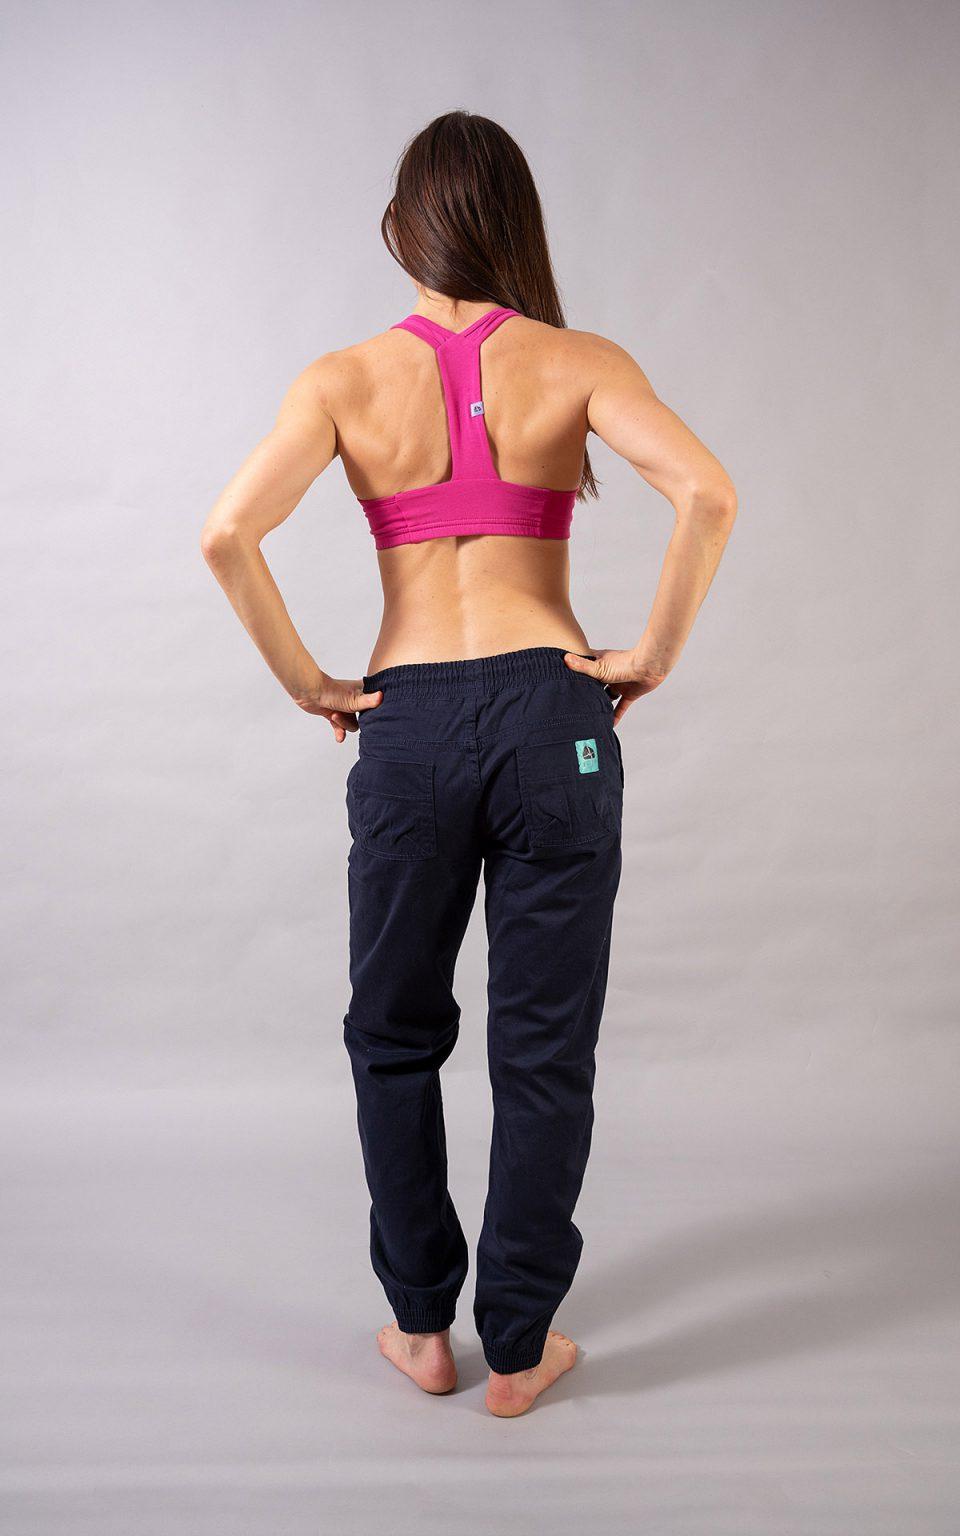 Classic bra top - pink